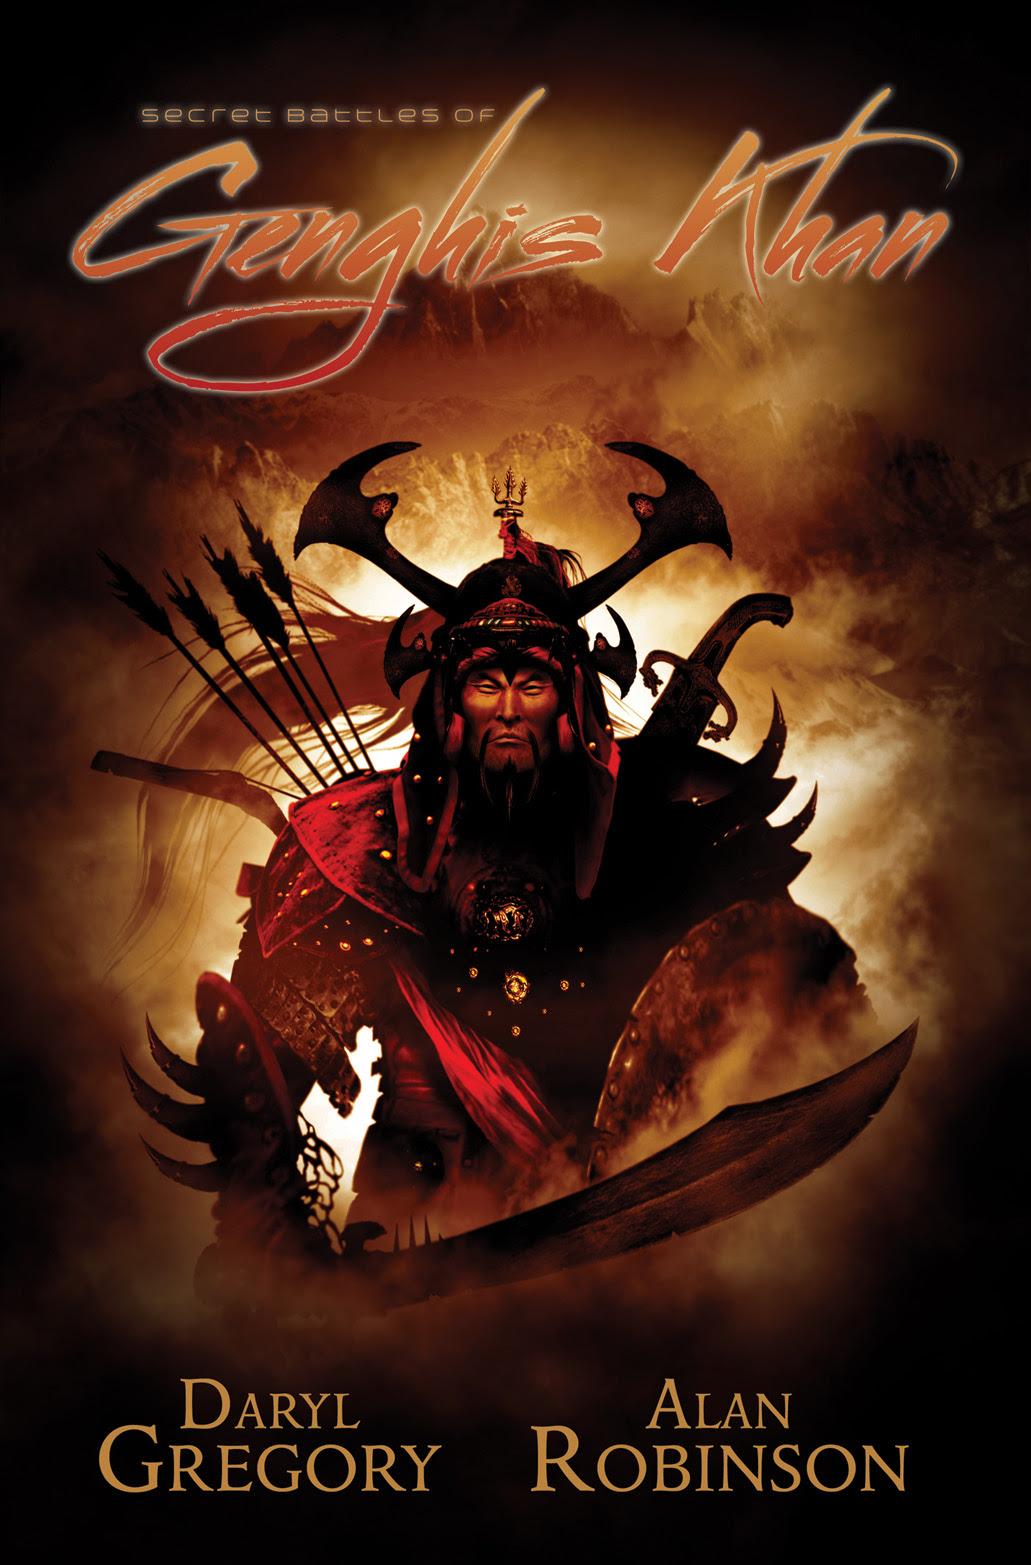 [Genghis Khan Cover Image]